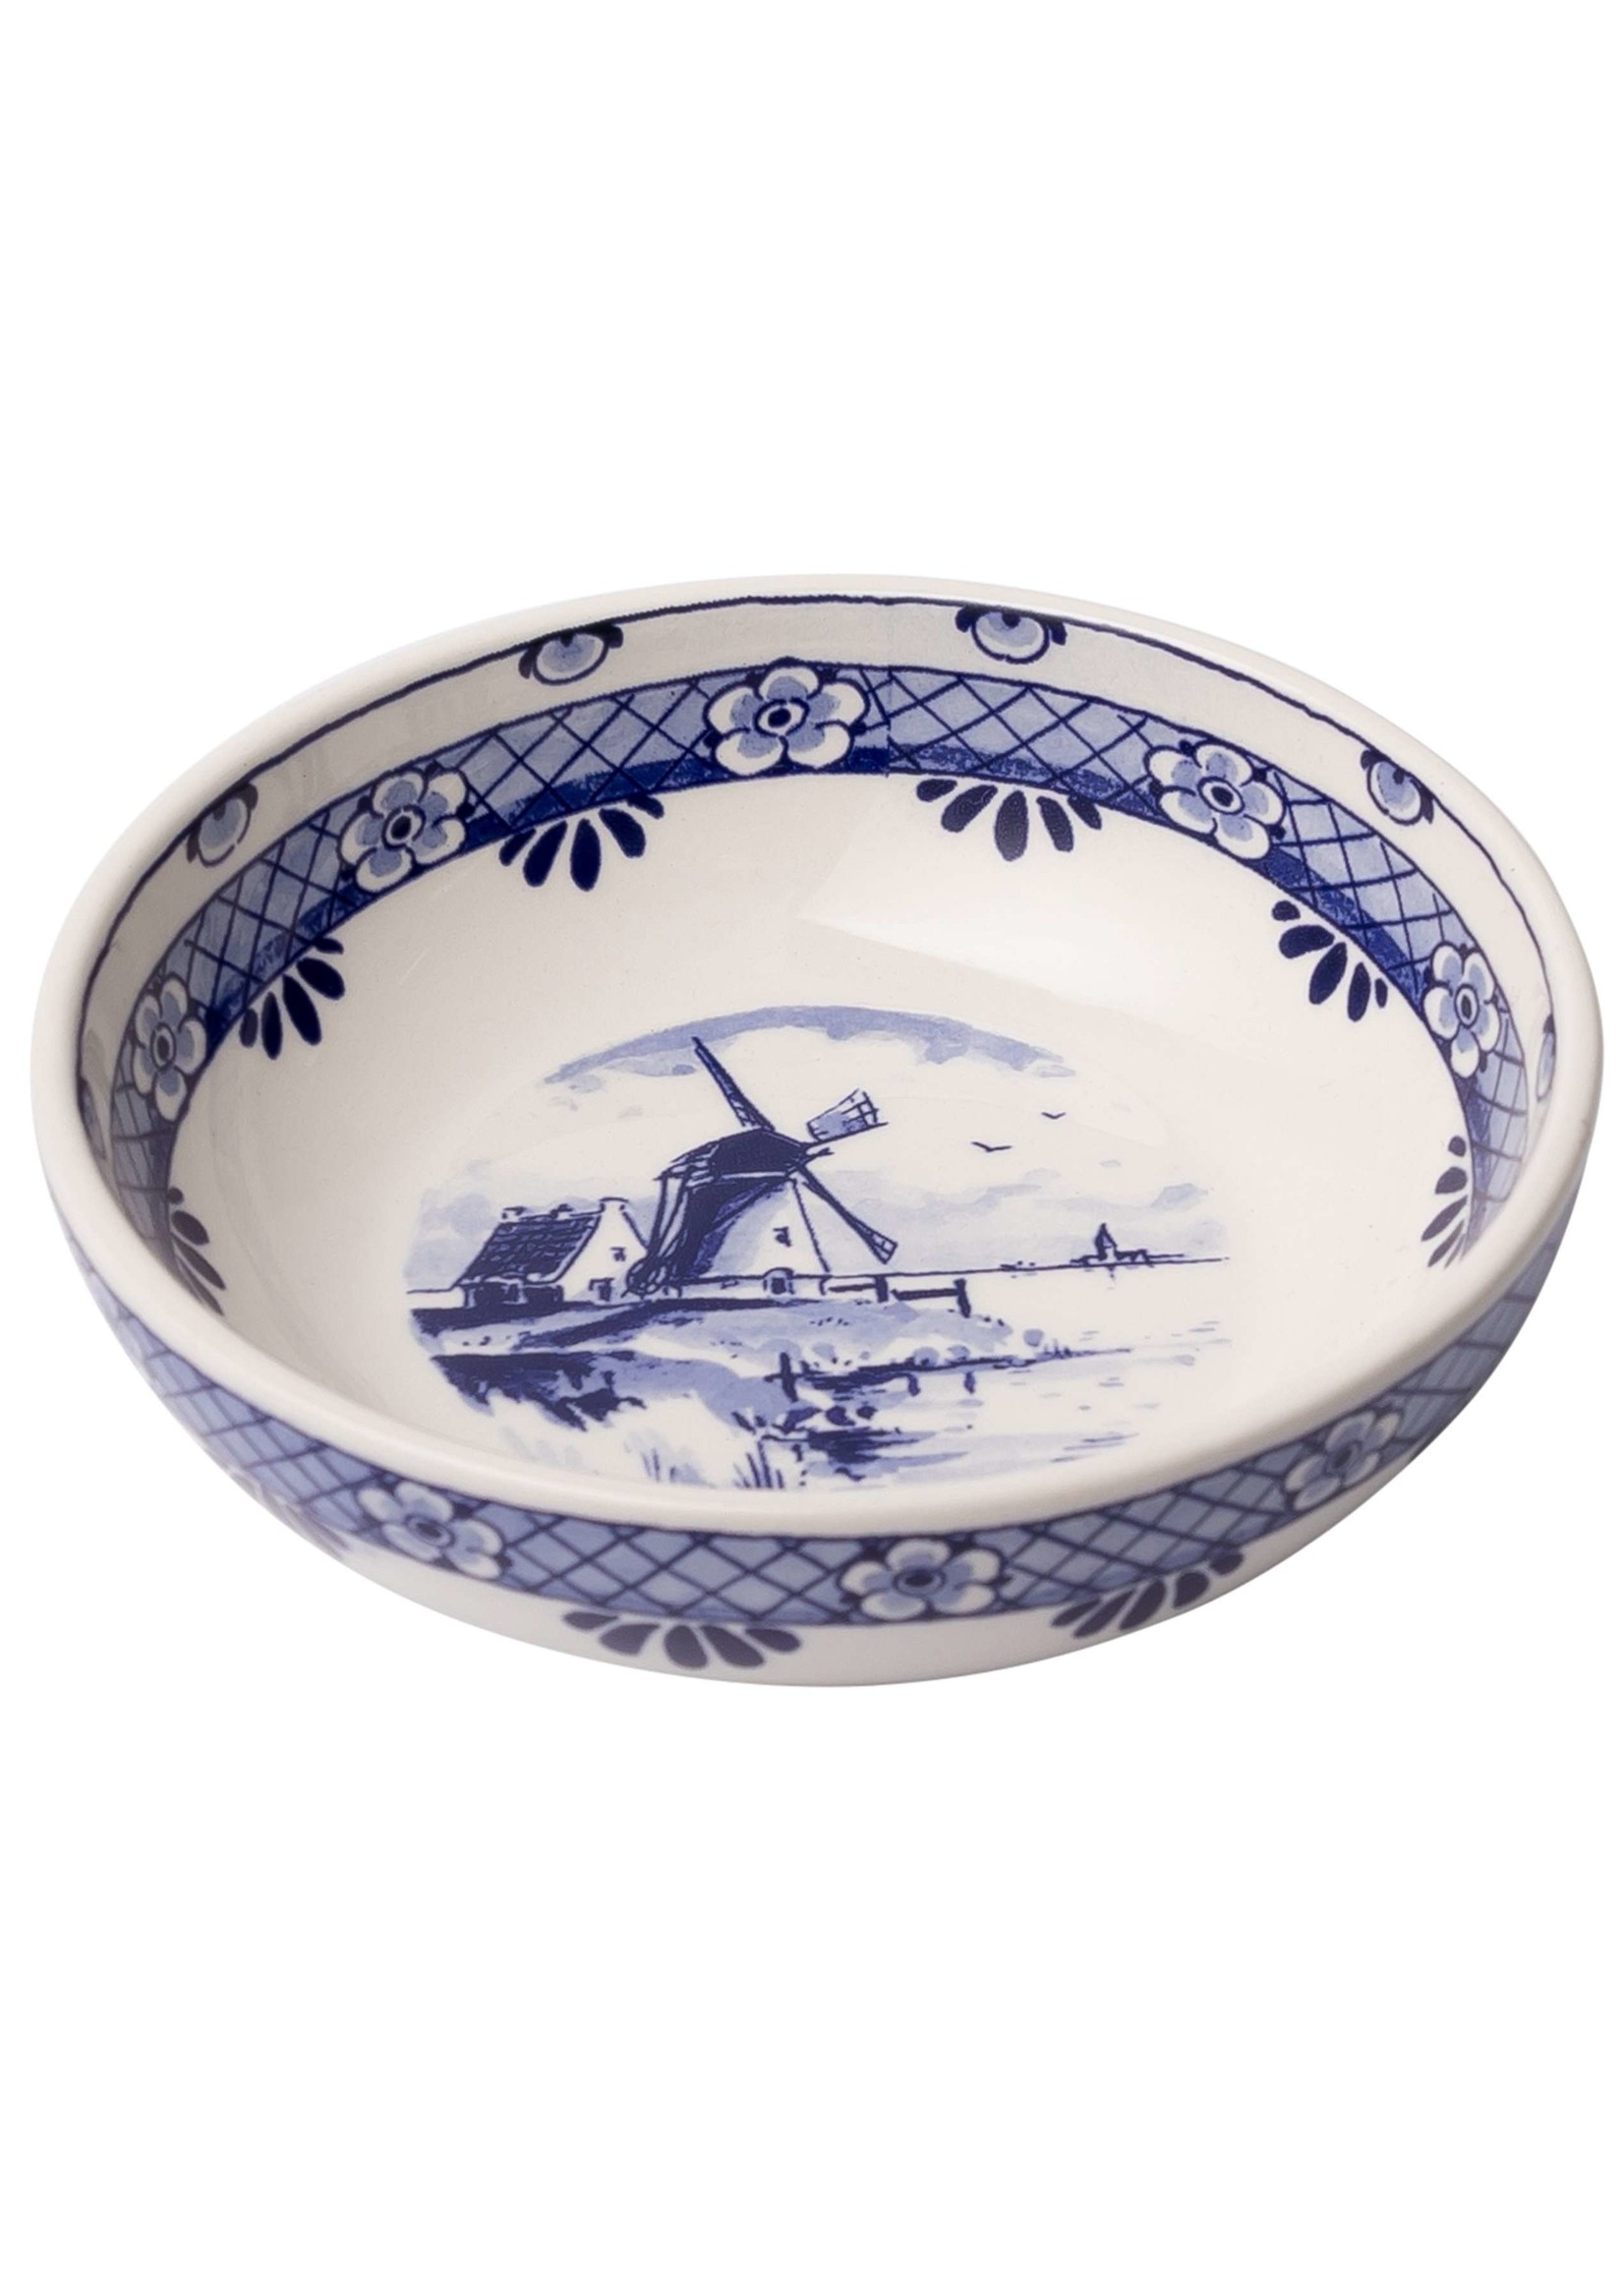 Delft Blue Tapas Bowl with a Windmill, Medium